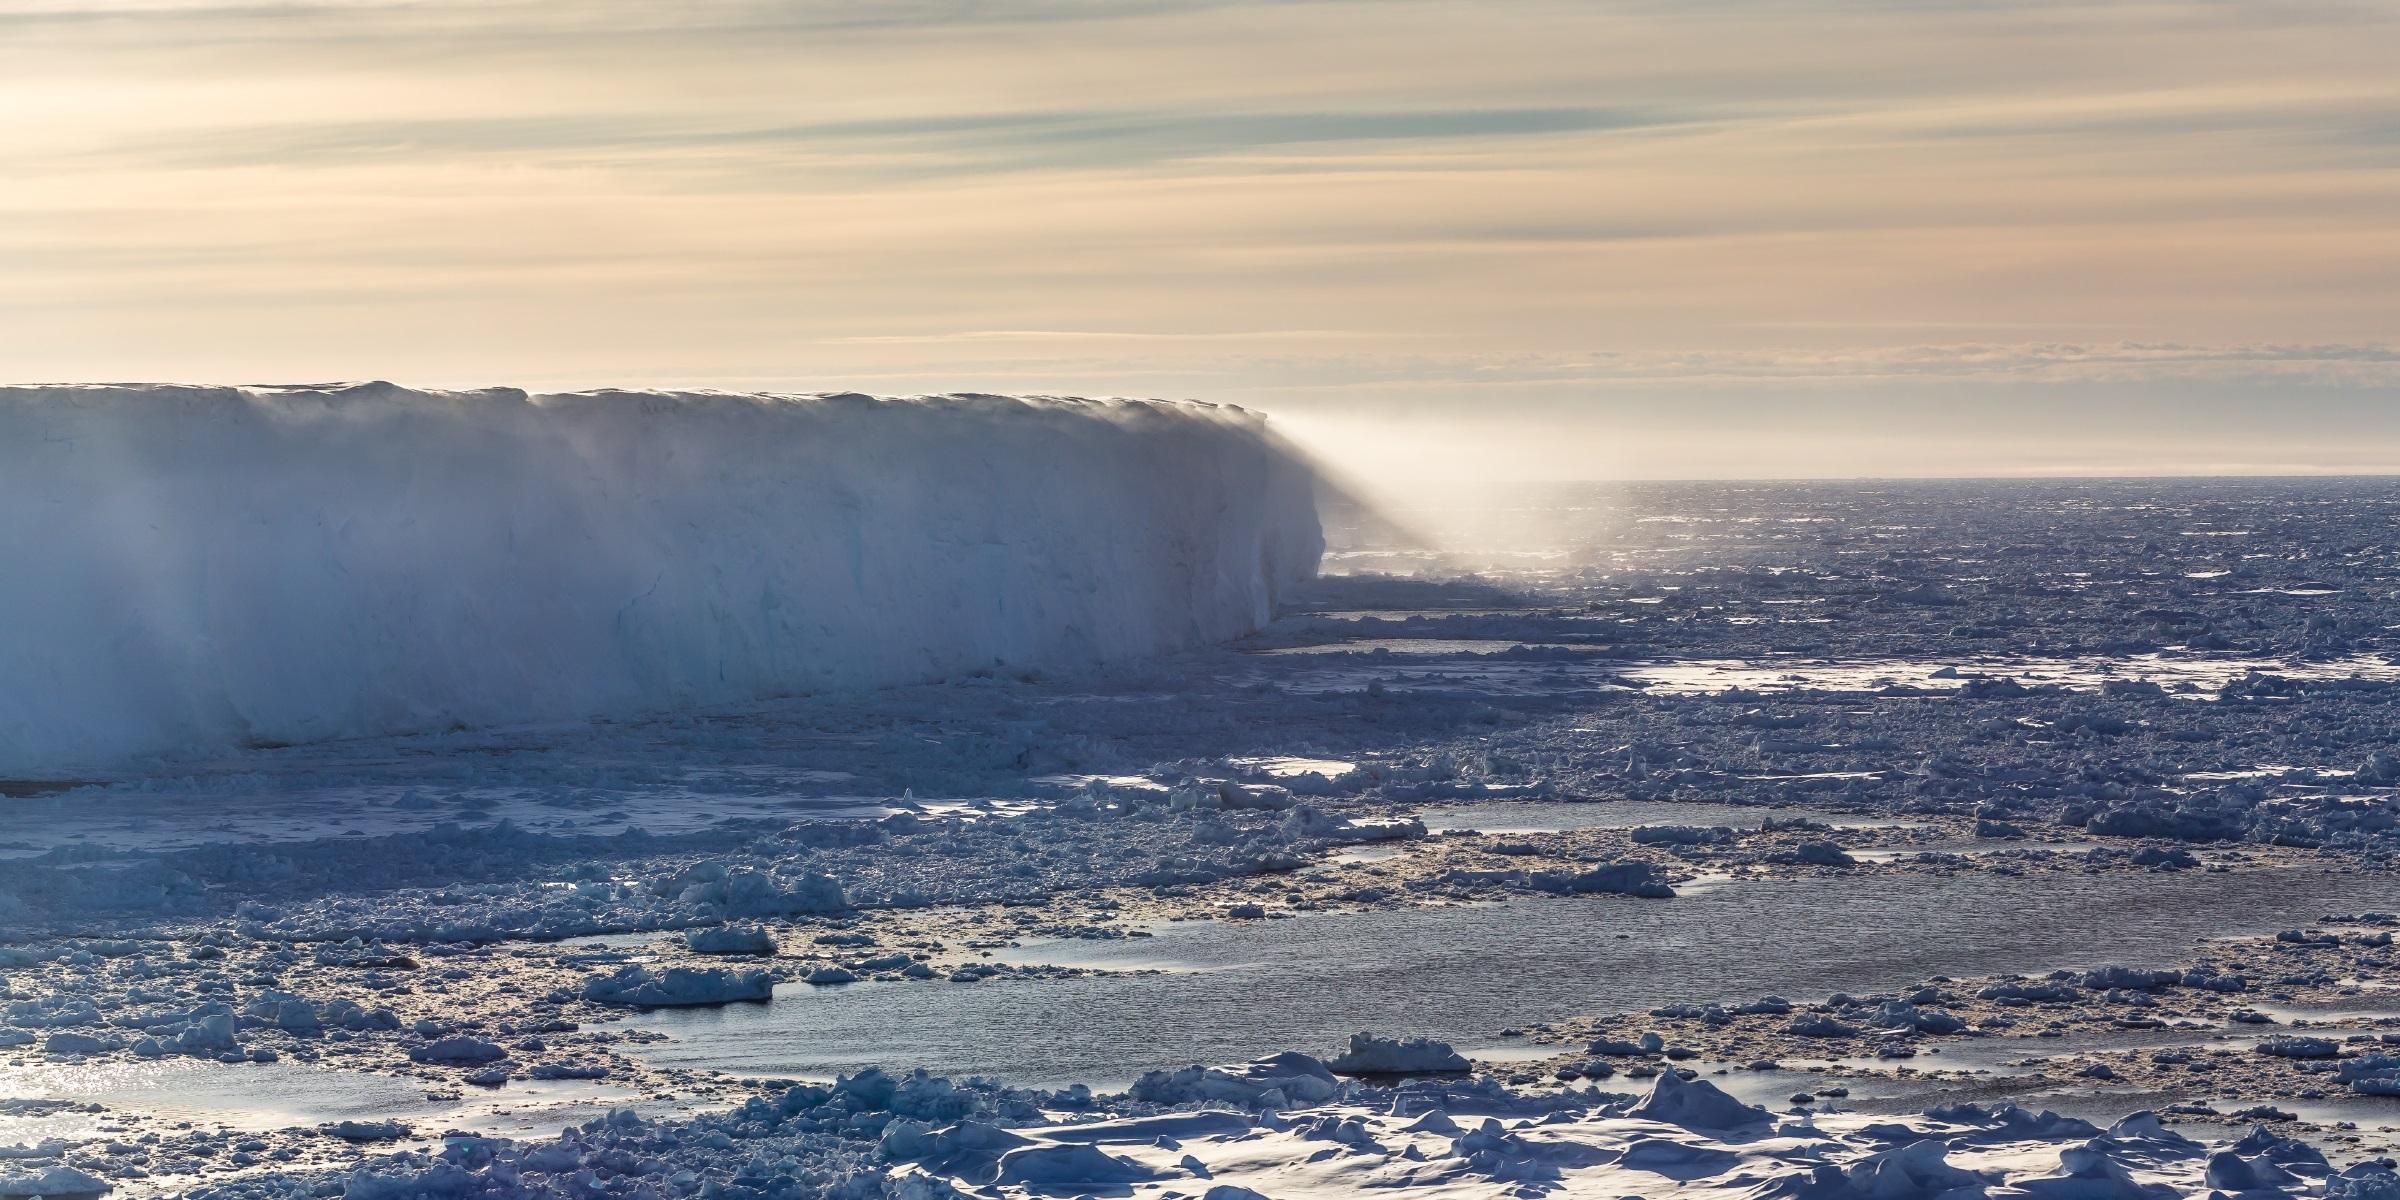 Shelf ice edge in the Atka Bay, eastern Weddell Sea, off the coast of West Antarctica. Credit: Alfred Wegener Institute/Stefan Hendricks.